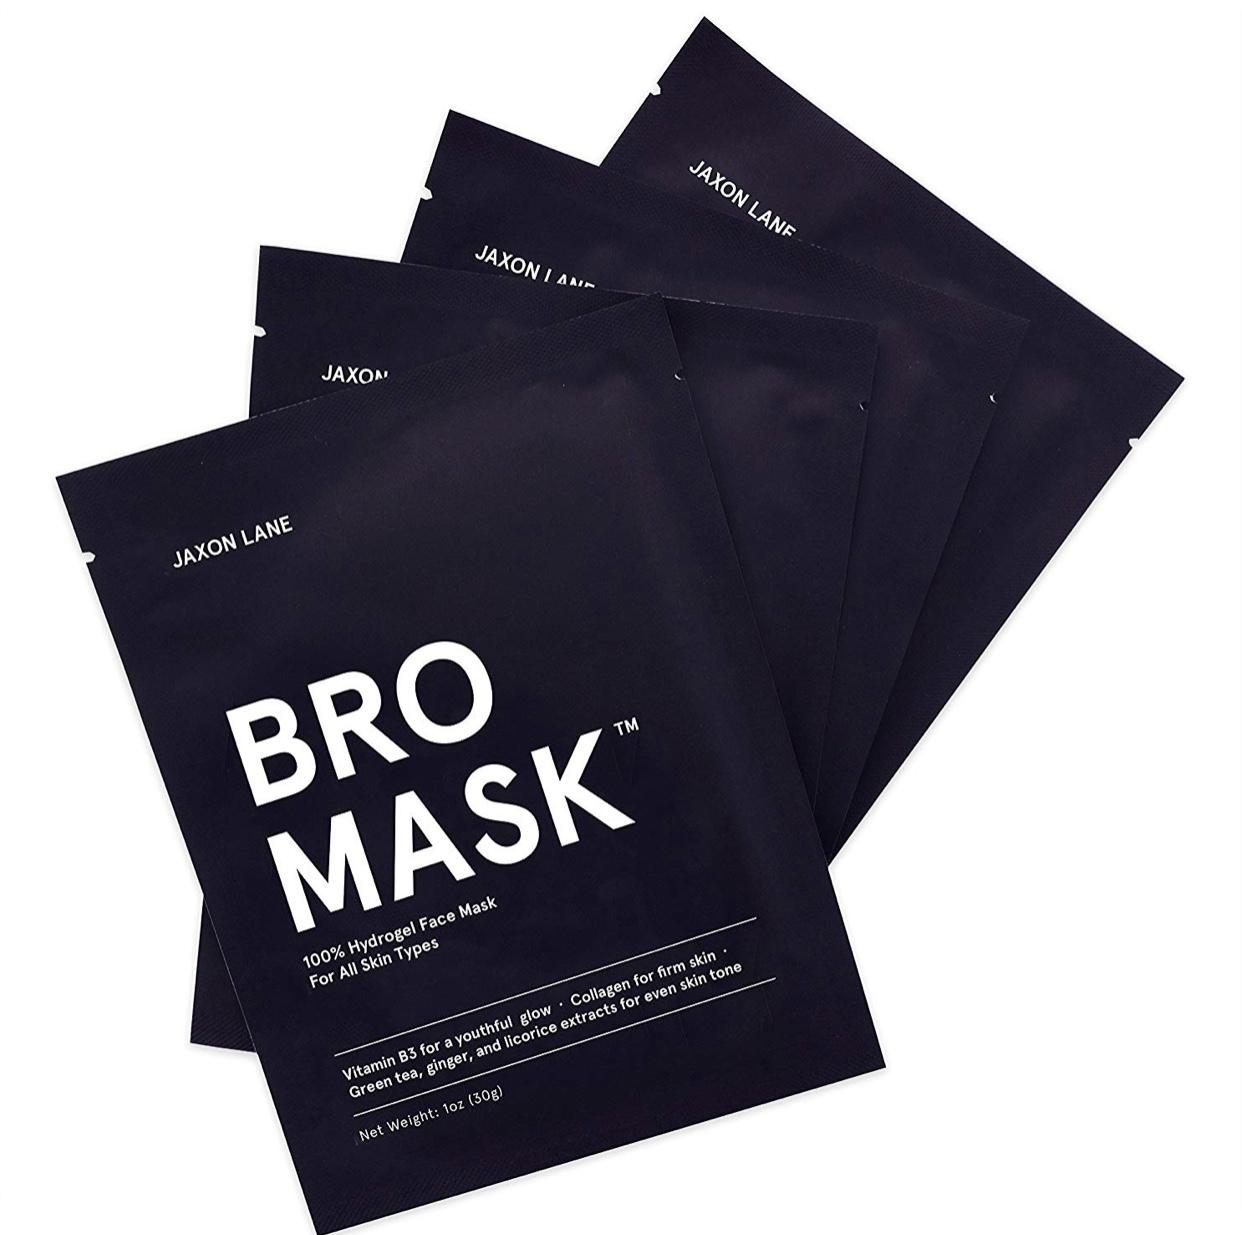 Jaxon Lane Bro Mask - a self-care gift for the holidays